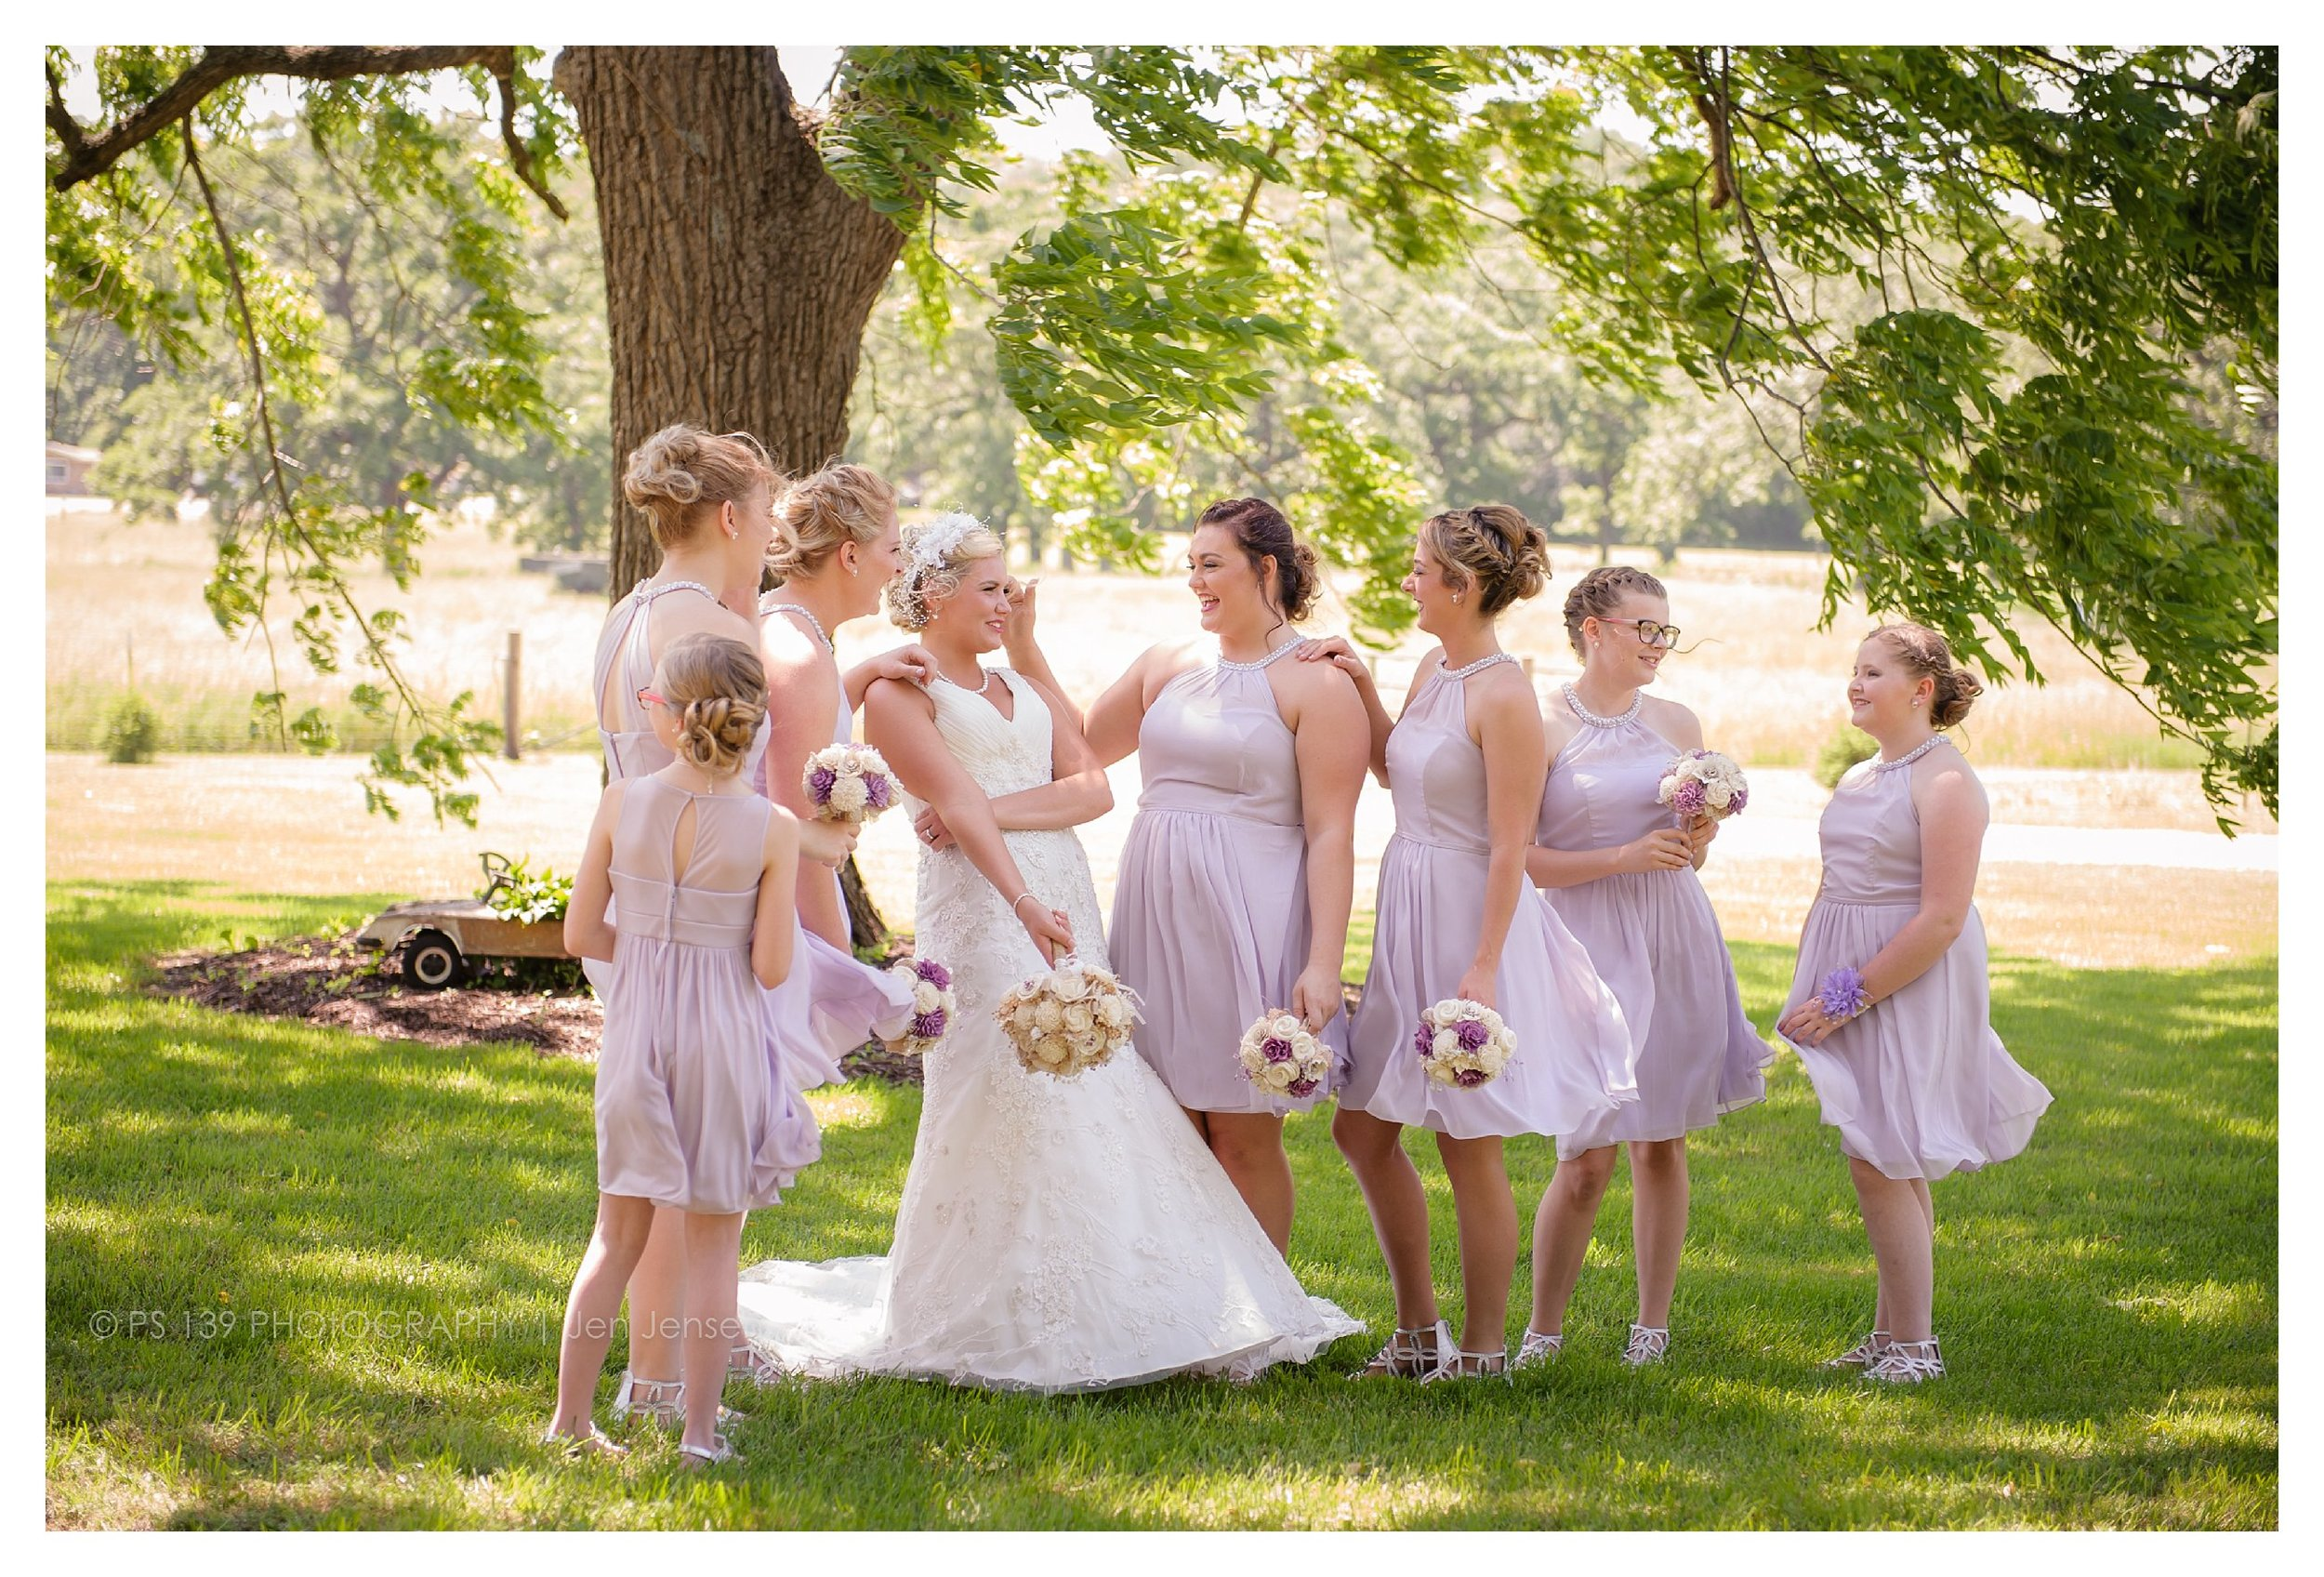 oregon Illinois oak lane farm wisconsin wedding photographer bayfield wi ps 139 photography jen jensen_0254.jpg